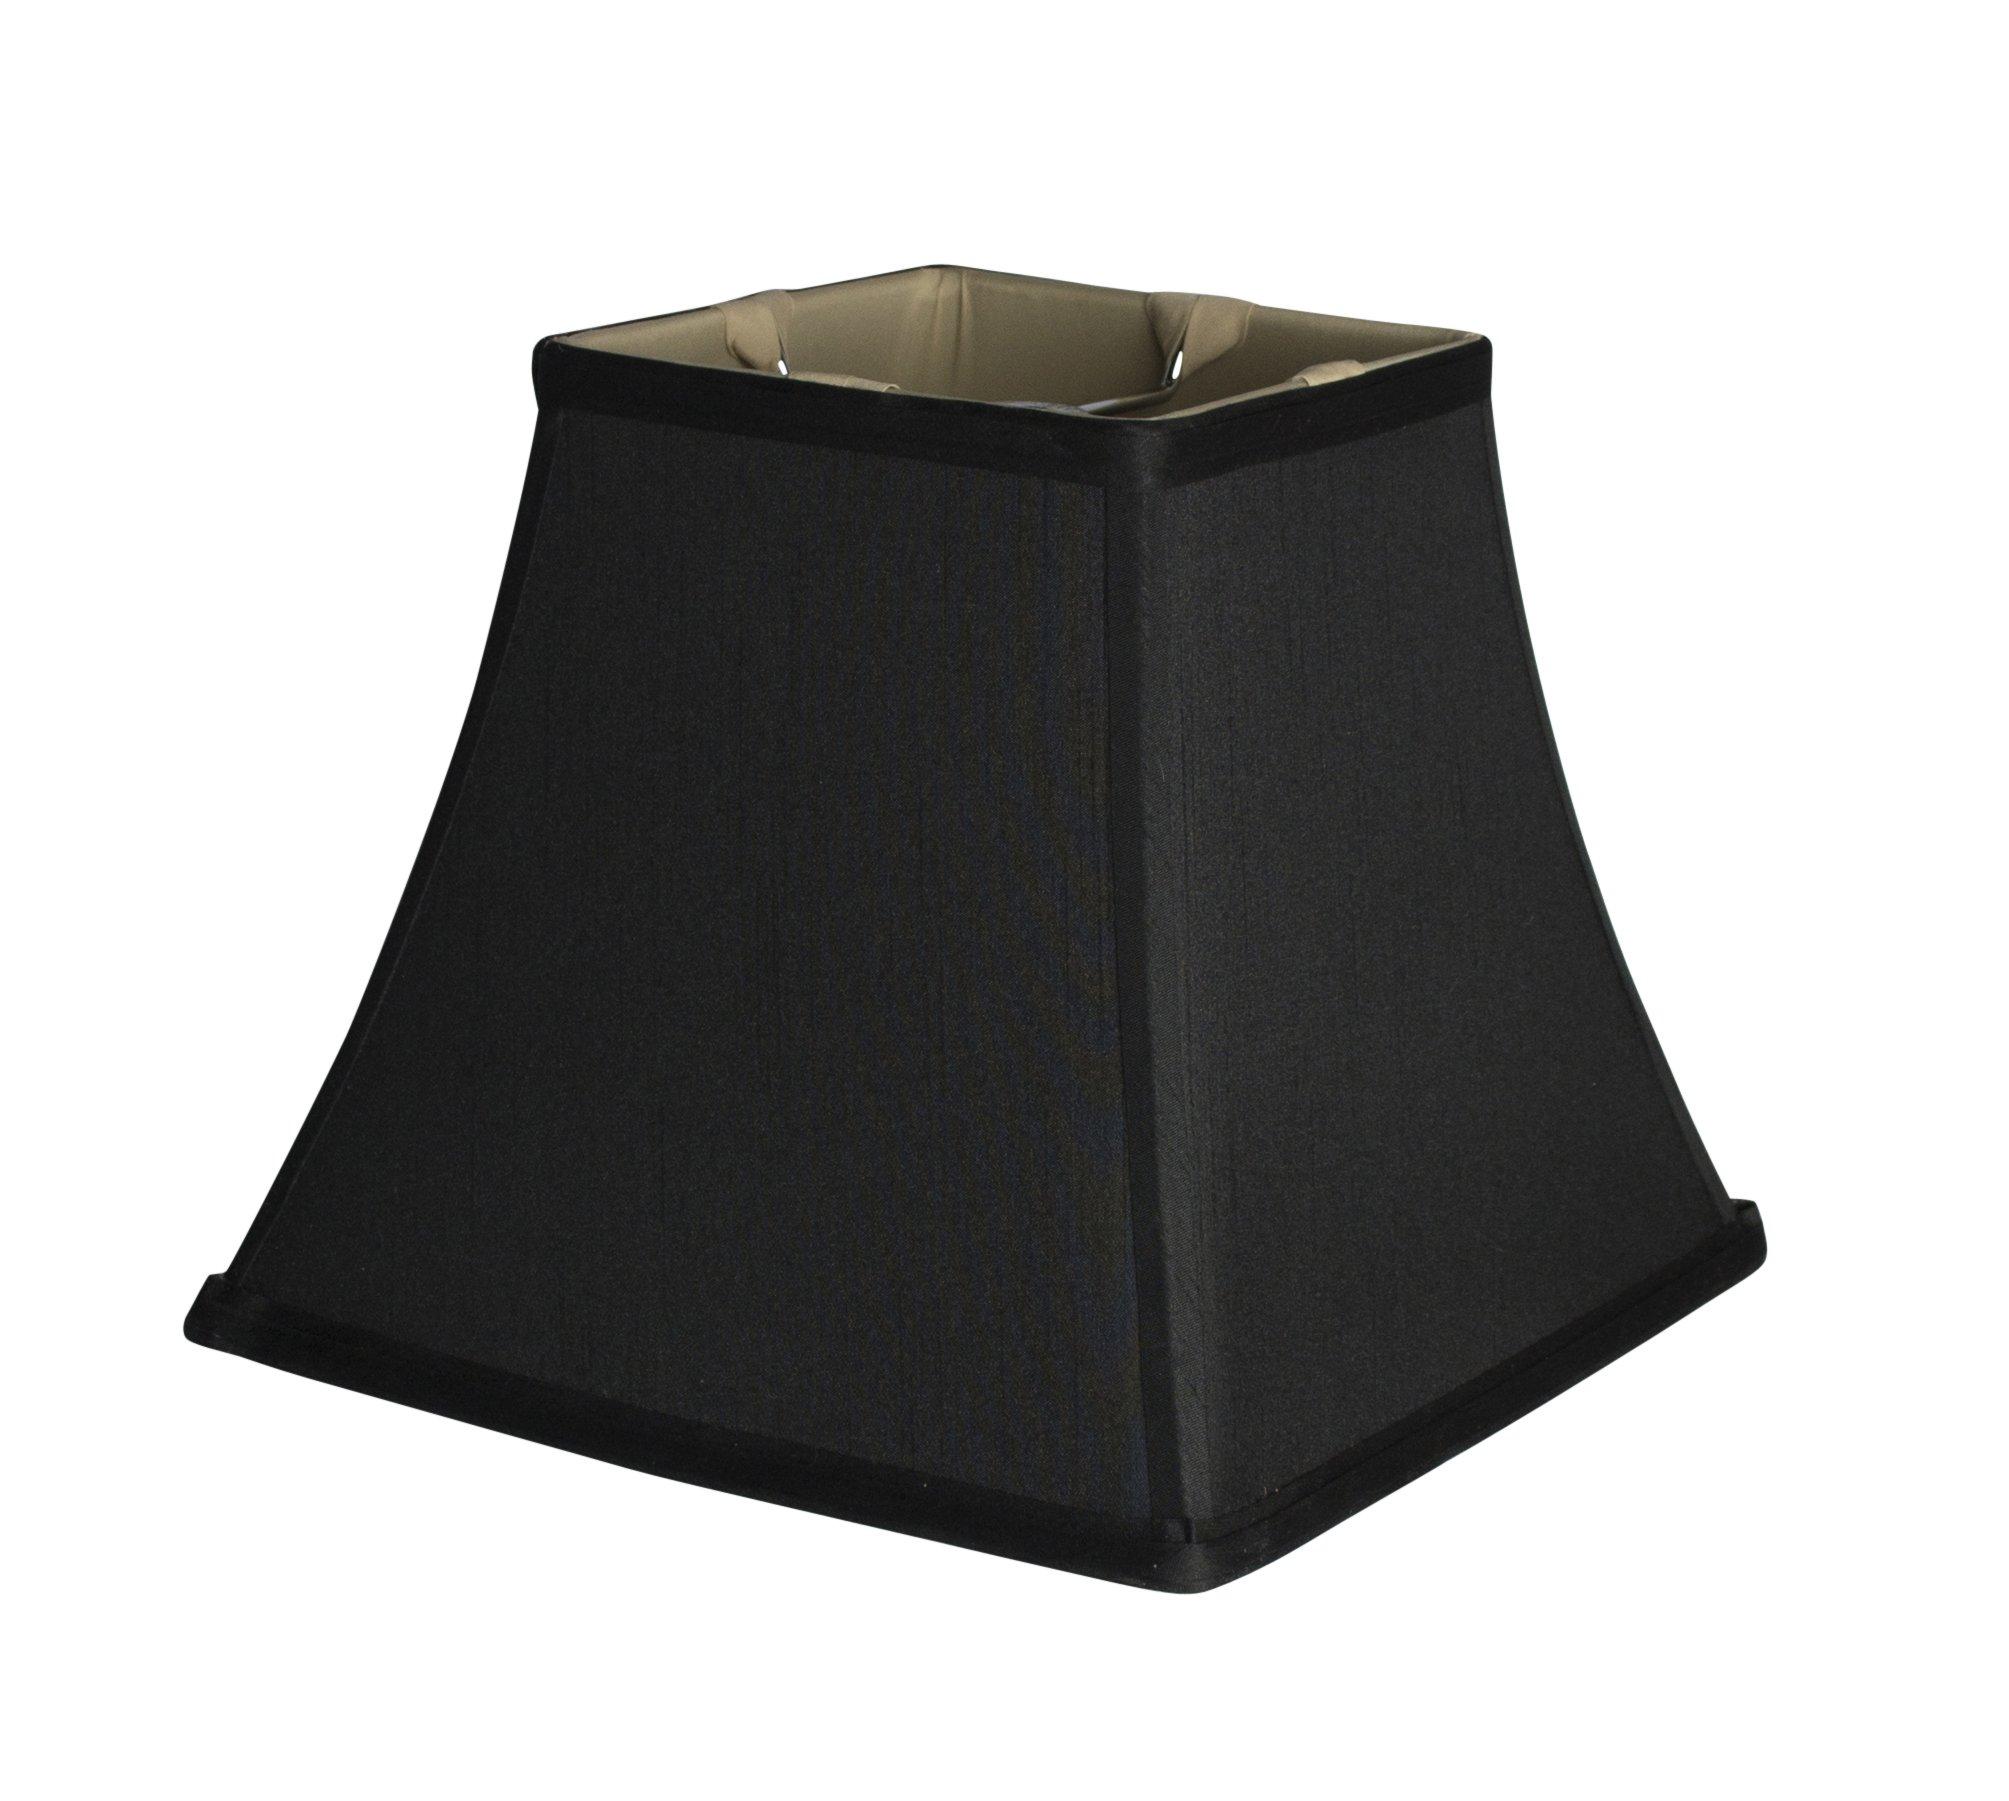 Urbanest Square 5.25x9x8'' Softback Bell Lampshade, Black, Faux Silk, Spider